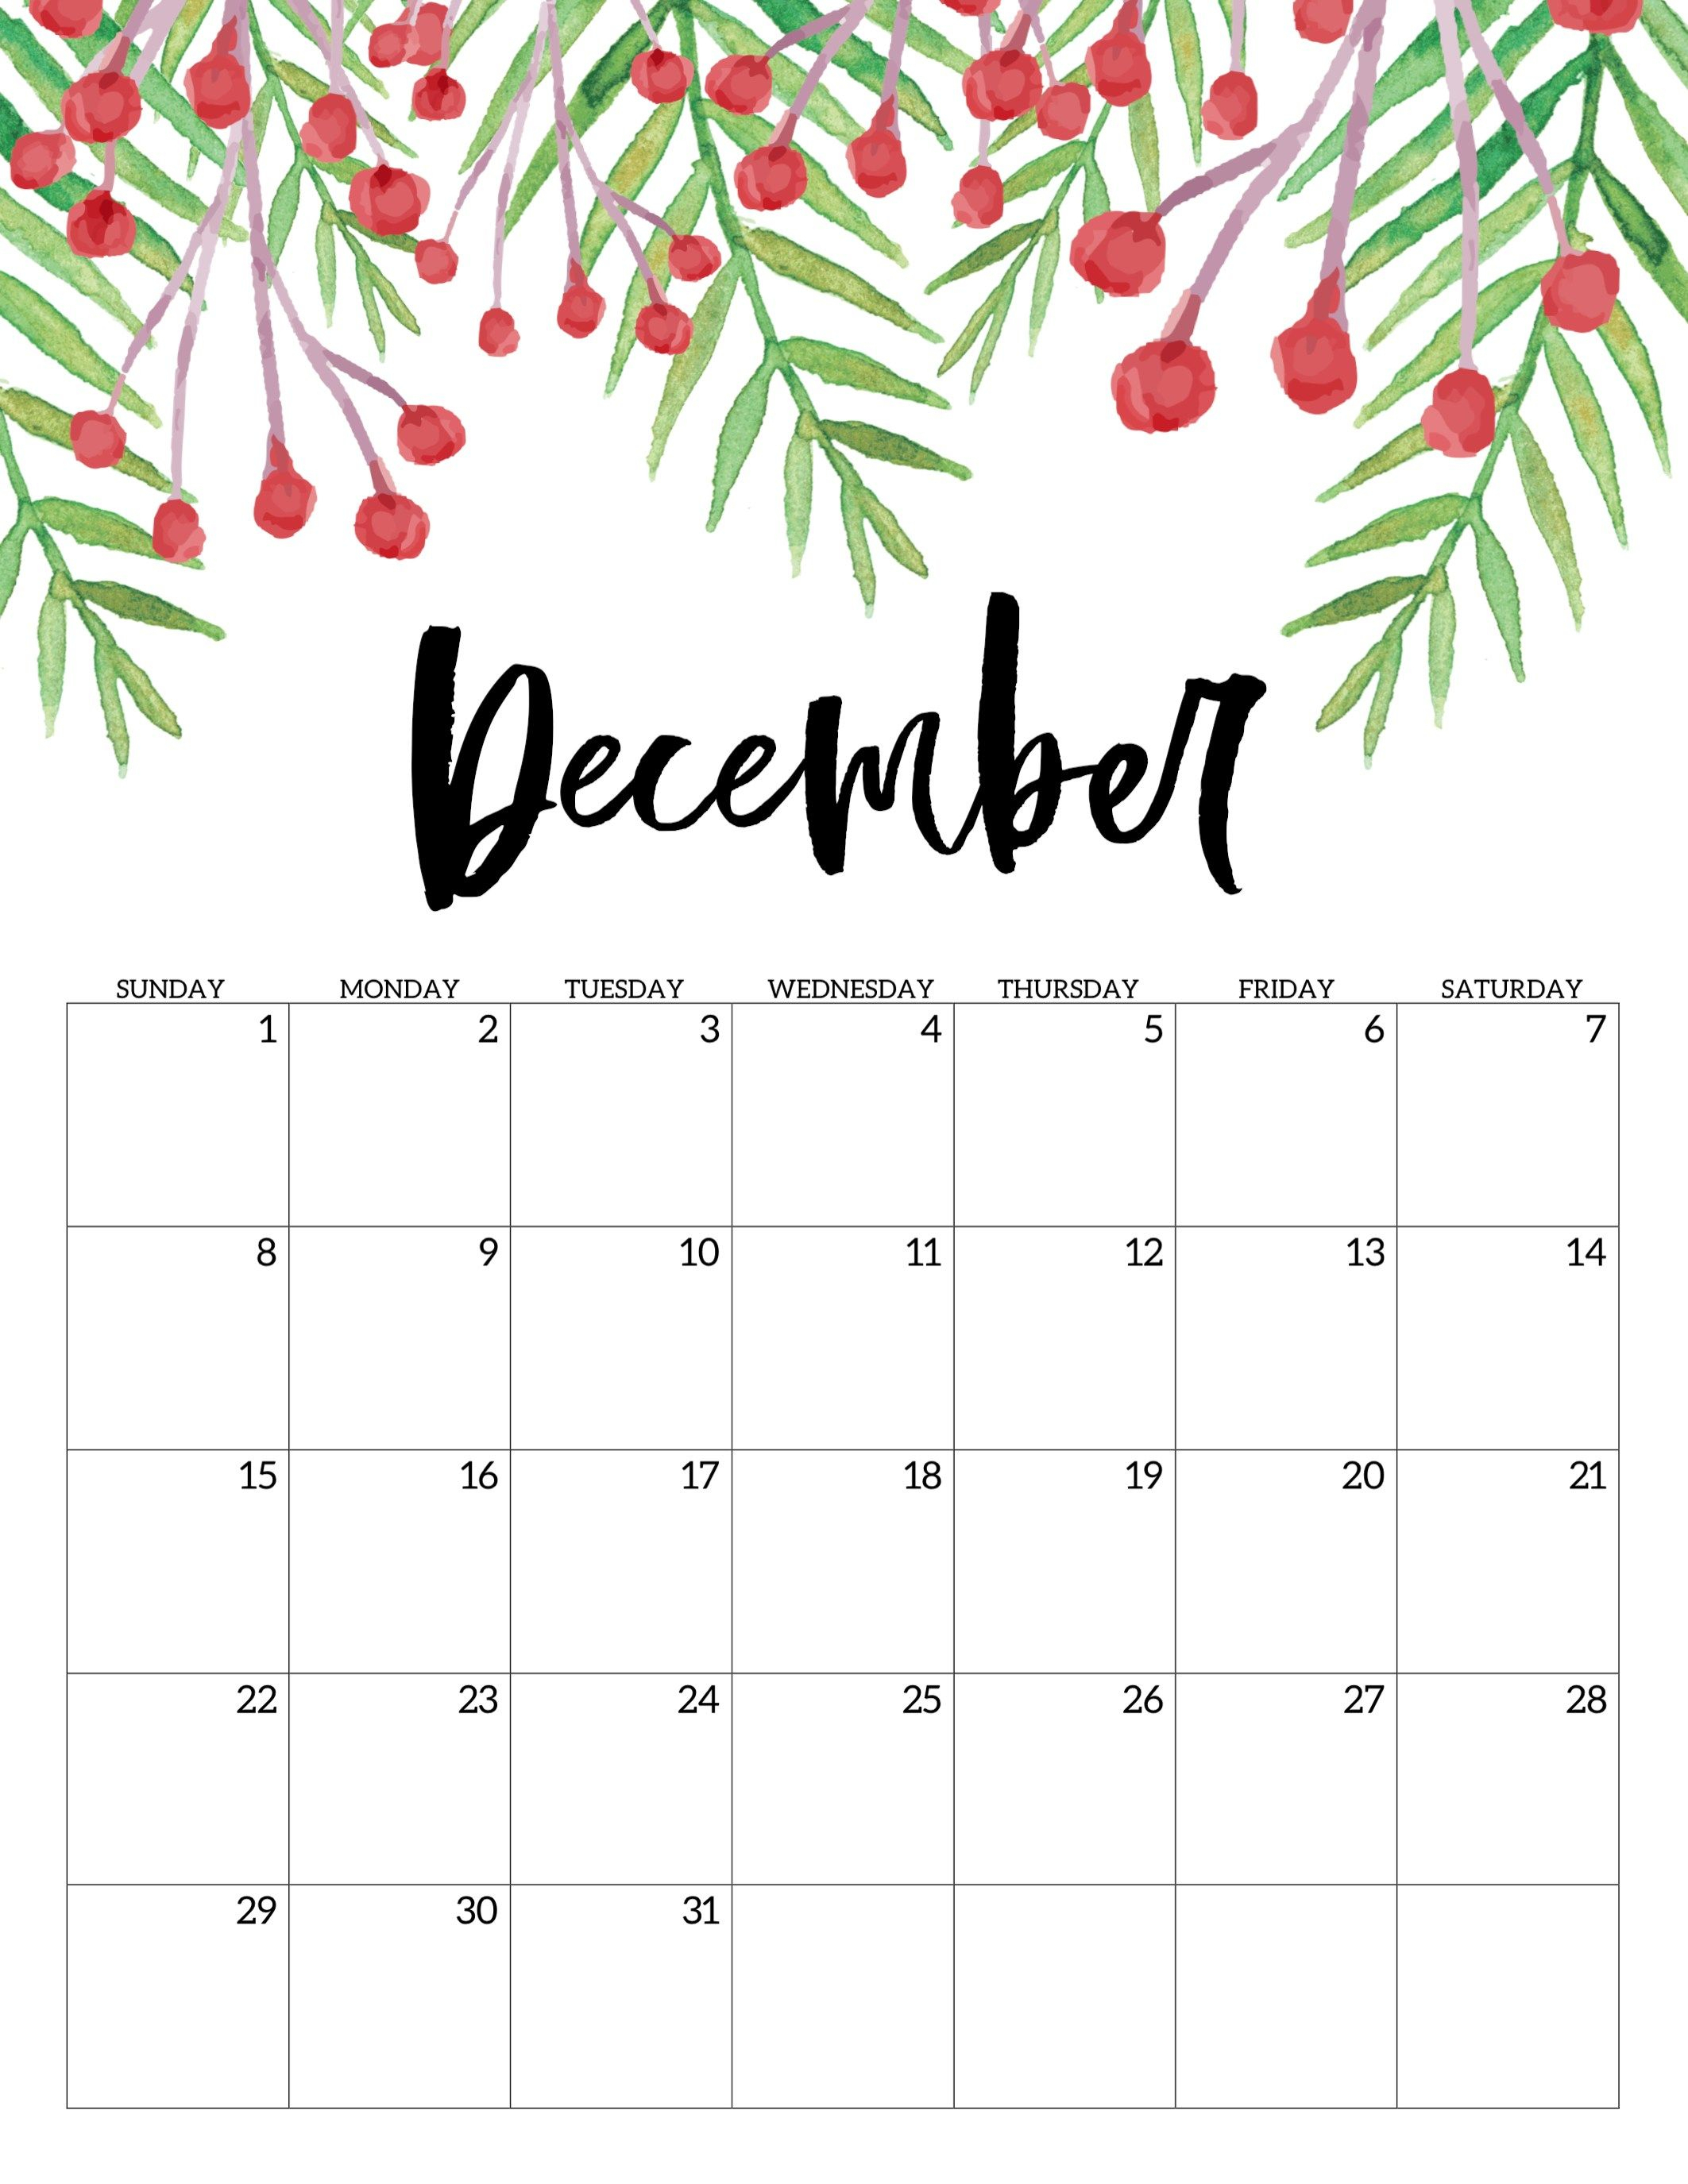 Free Printable Calendar 2019 - Floral   Ежемесячные